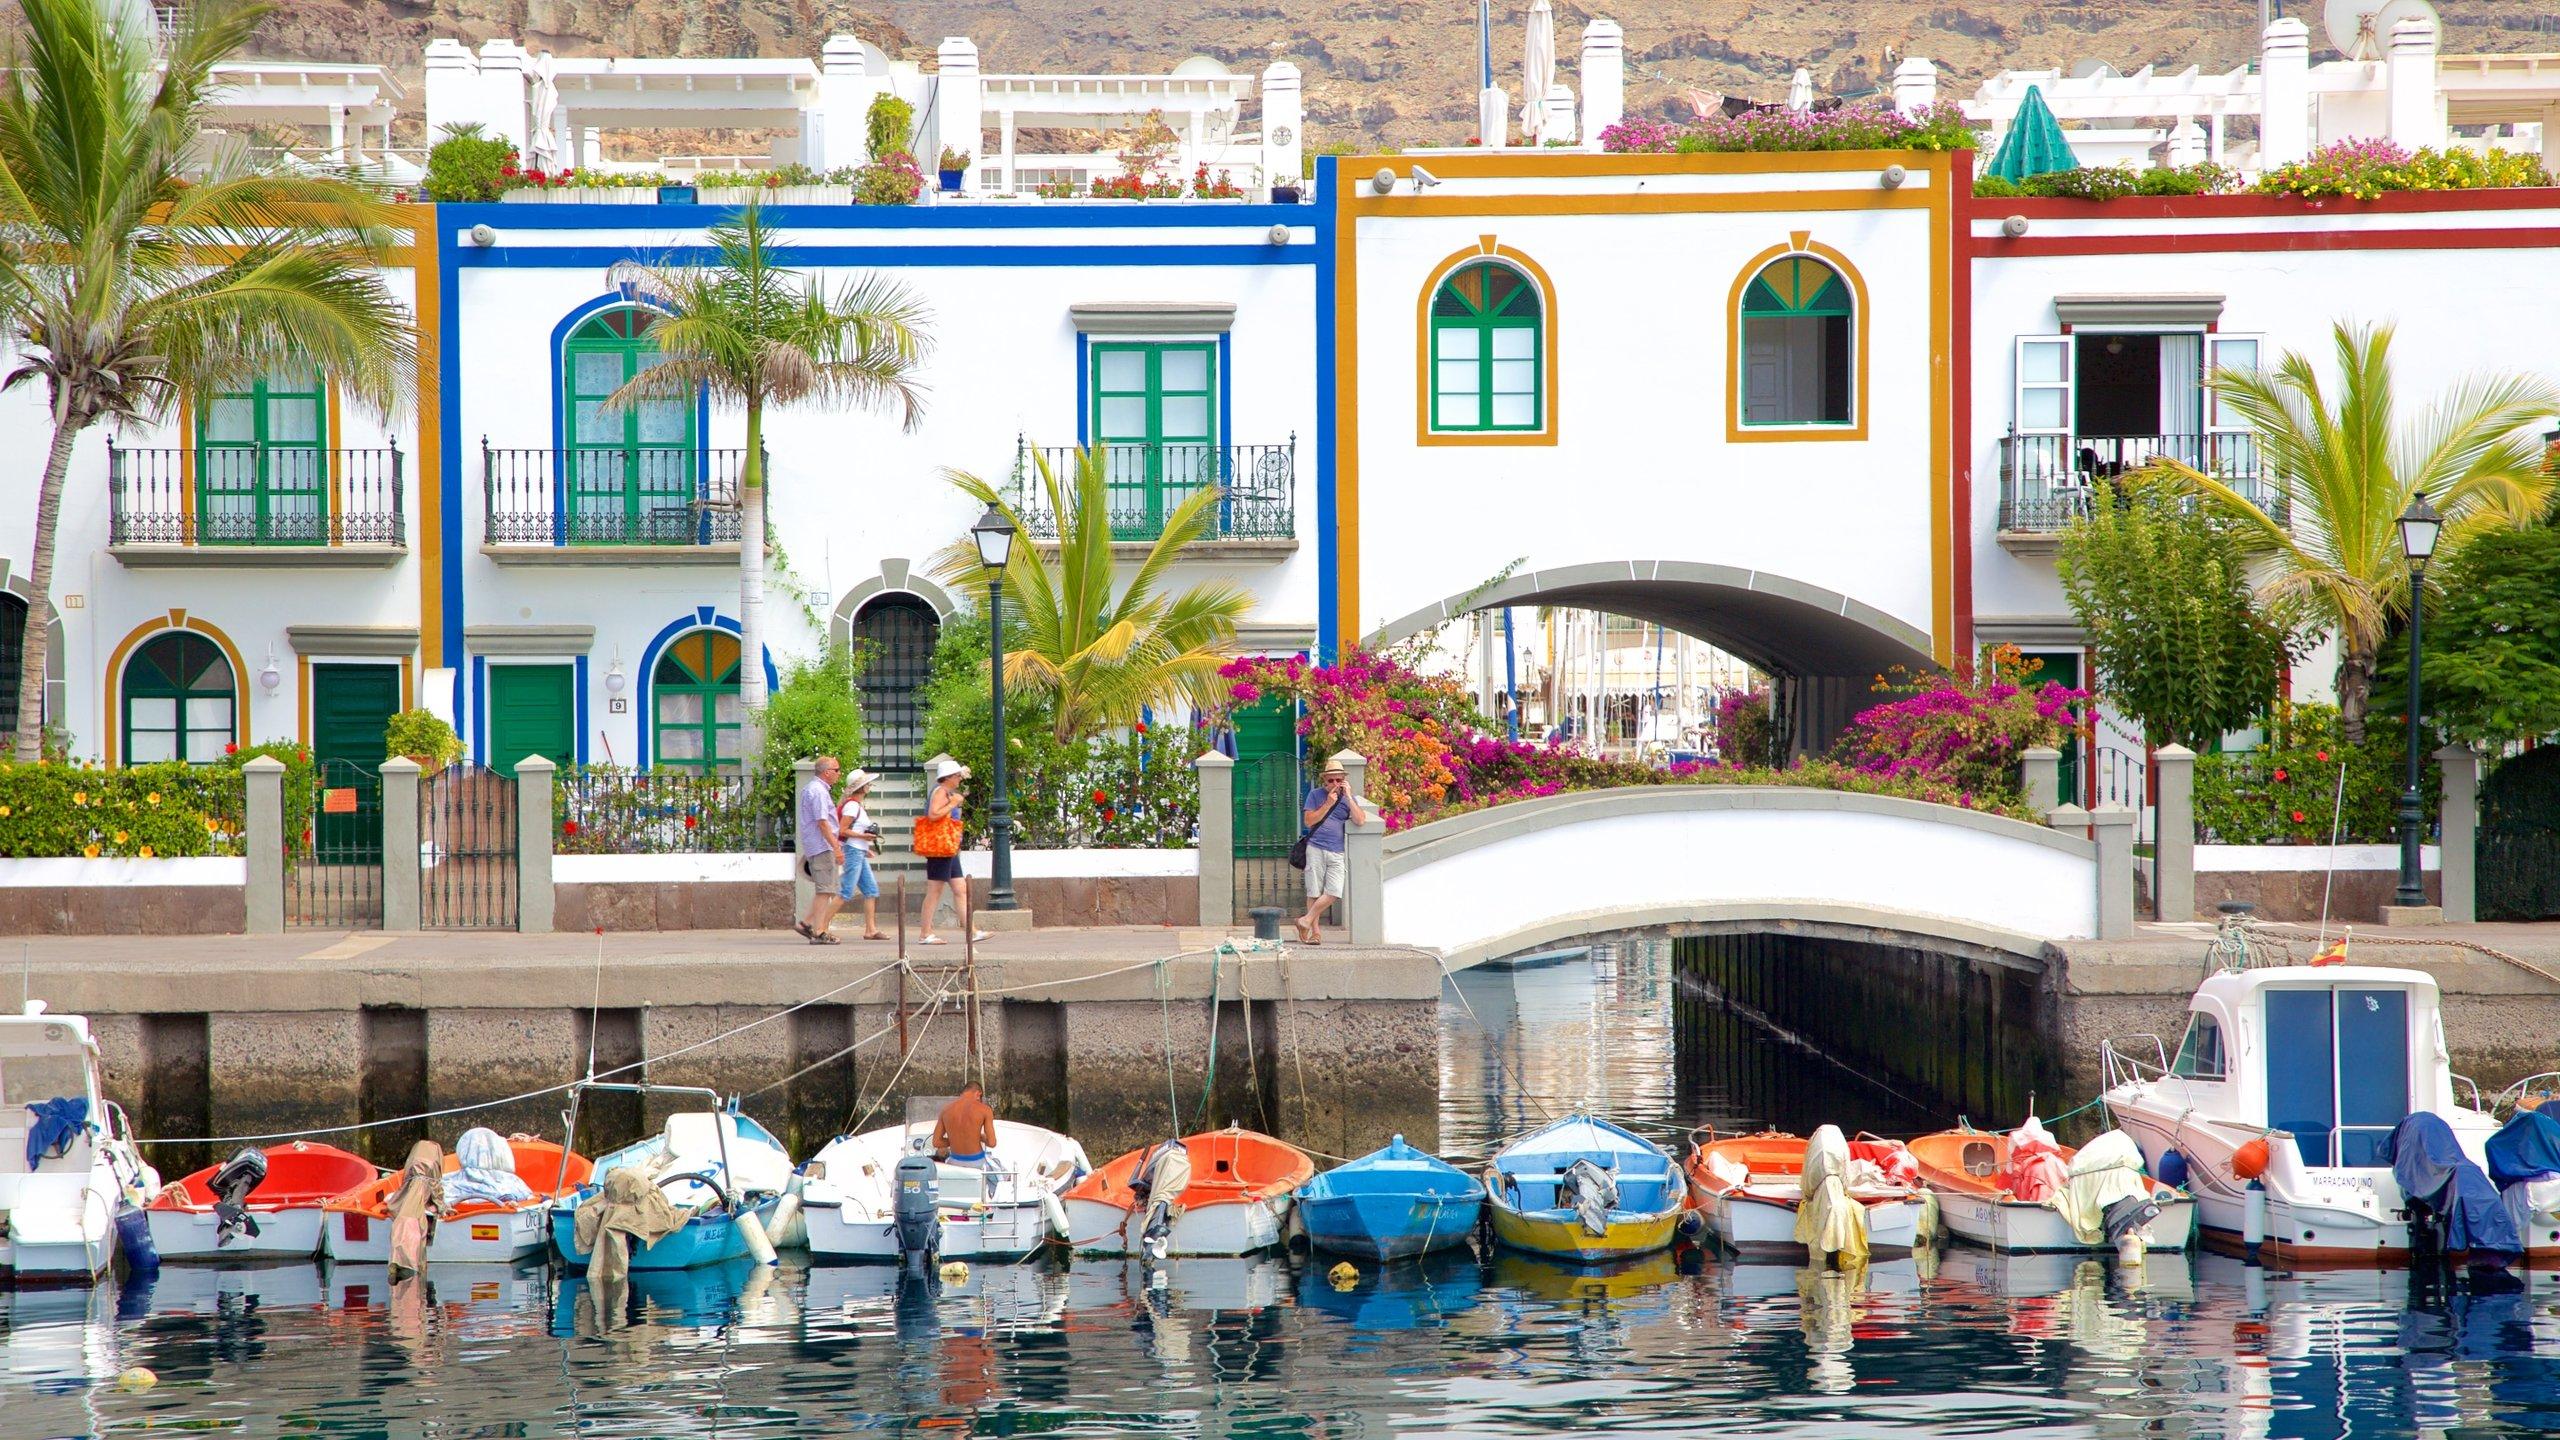 Mogan Port, Mogan, Canary Islands, Spain